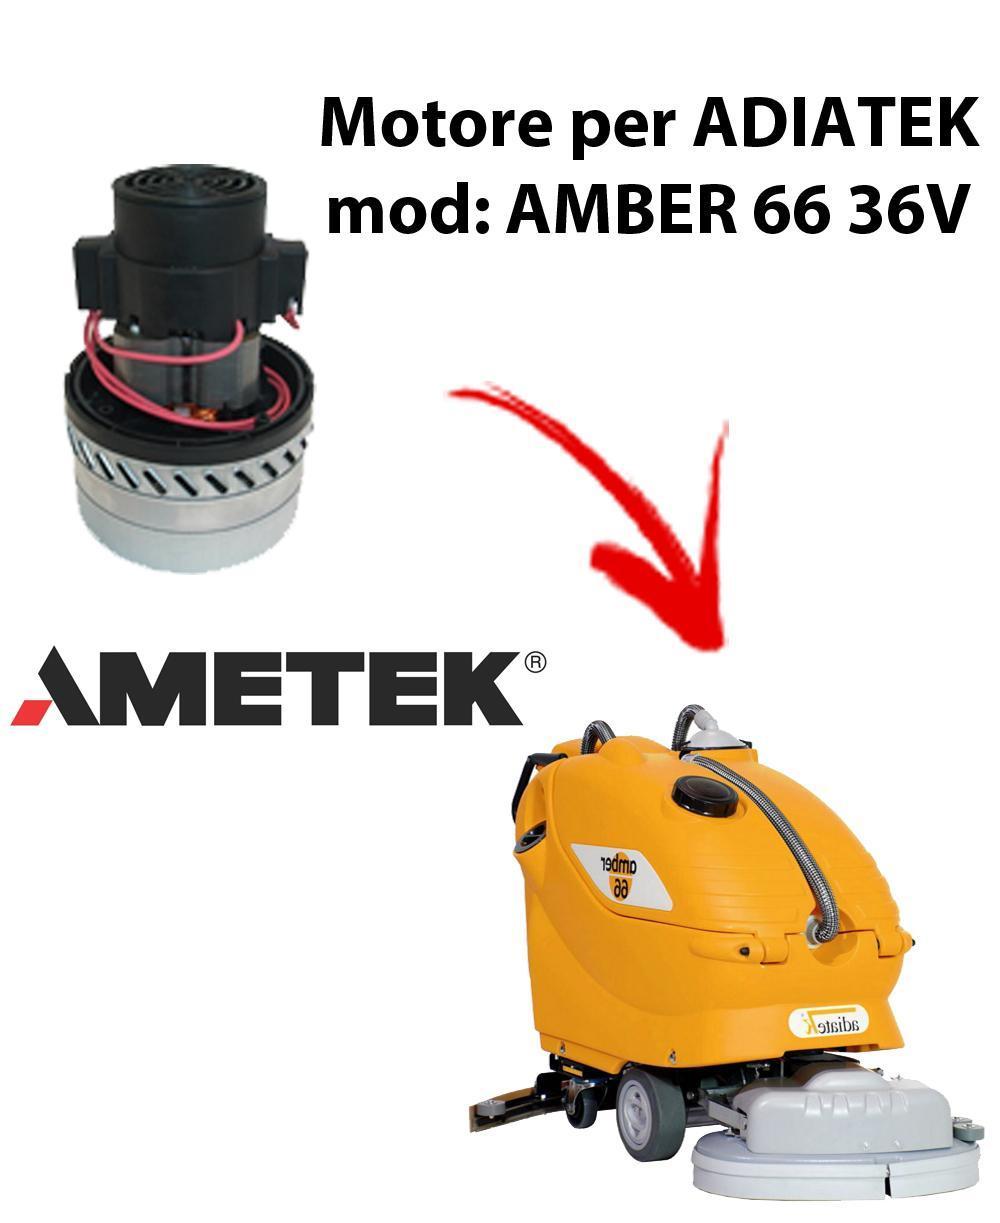 Amber 66 - 36 volt Vacuum motors AMETEK Italia for scrubber dryer Adiatek